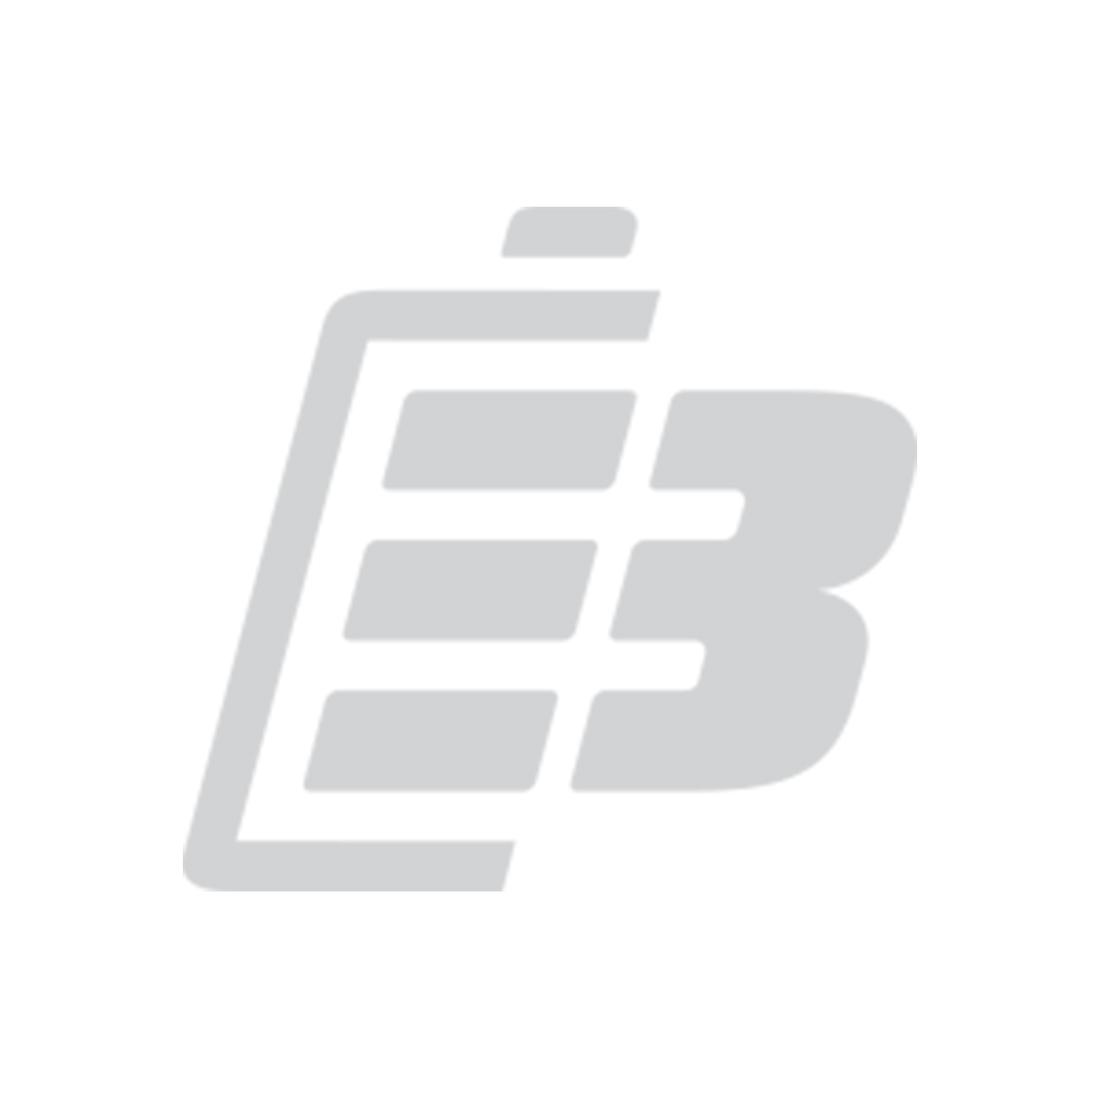 Wireless controller battery Sony PlayStation Dualshock 3_1